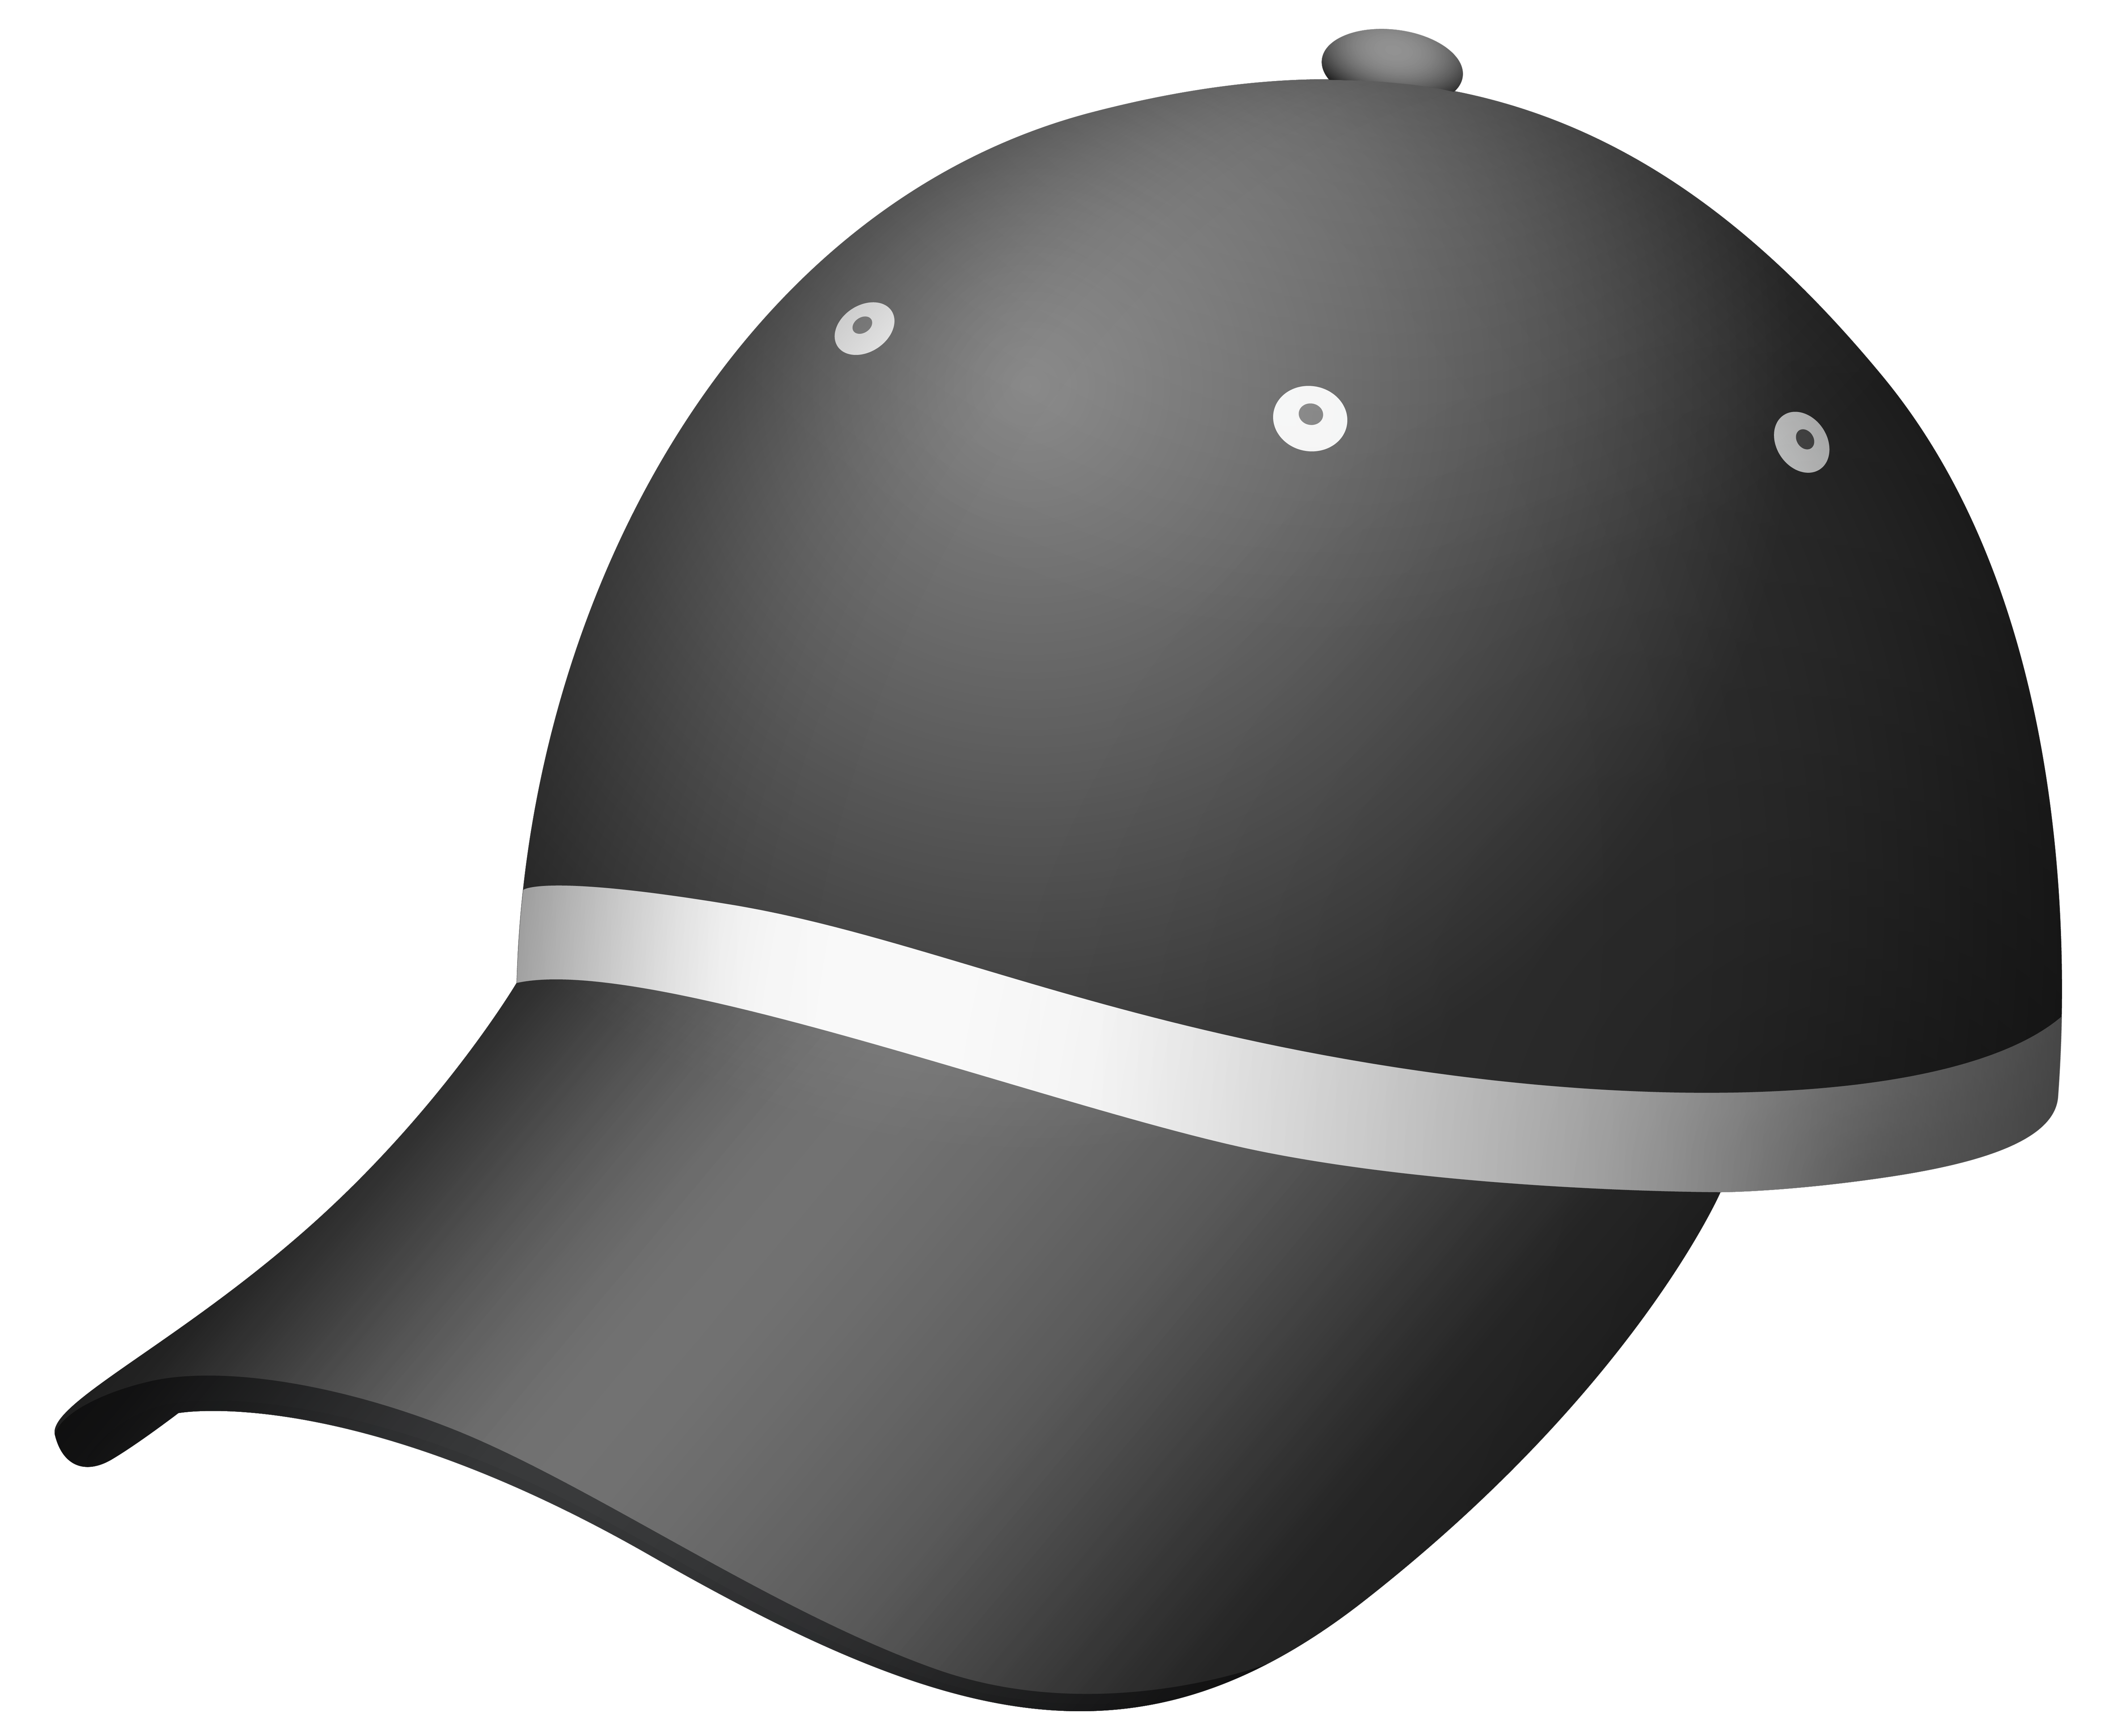 Dark gray cap png. Hats clipart bakery